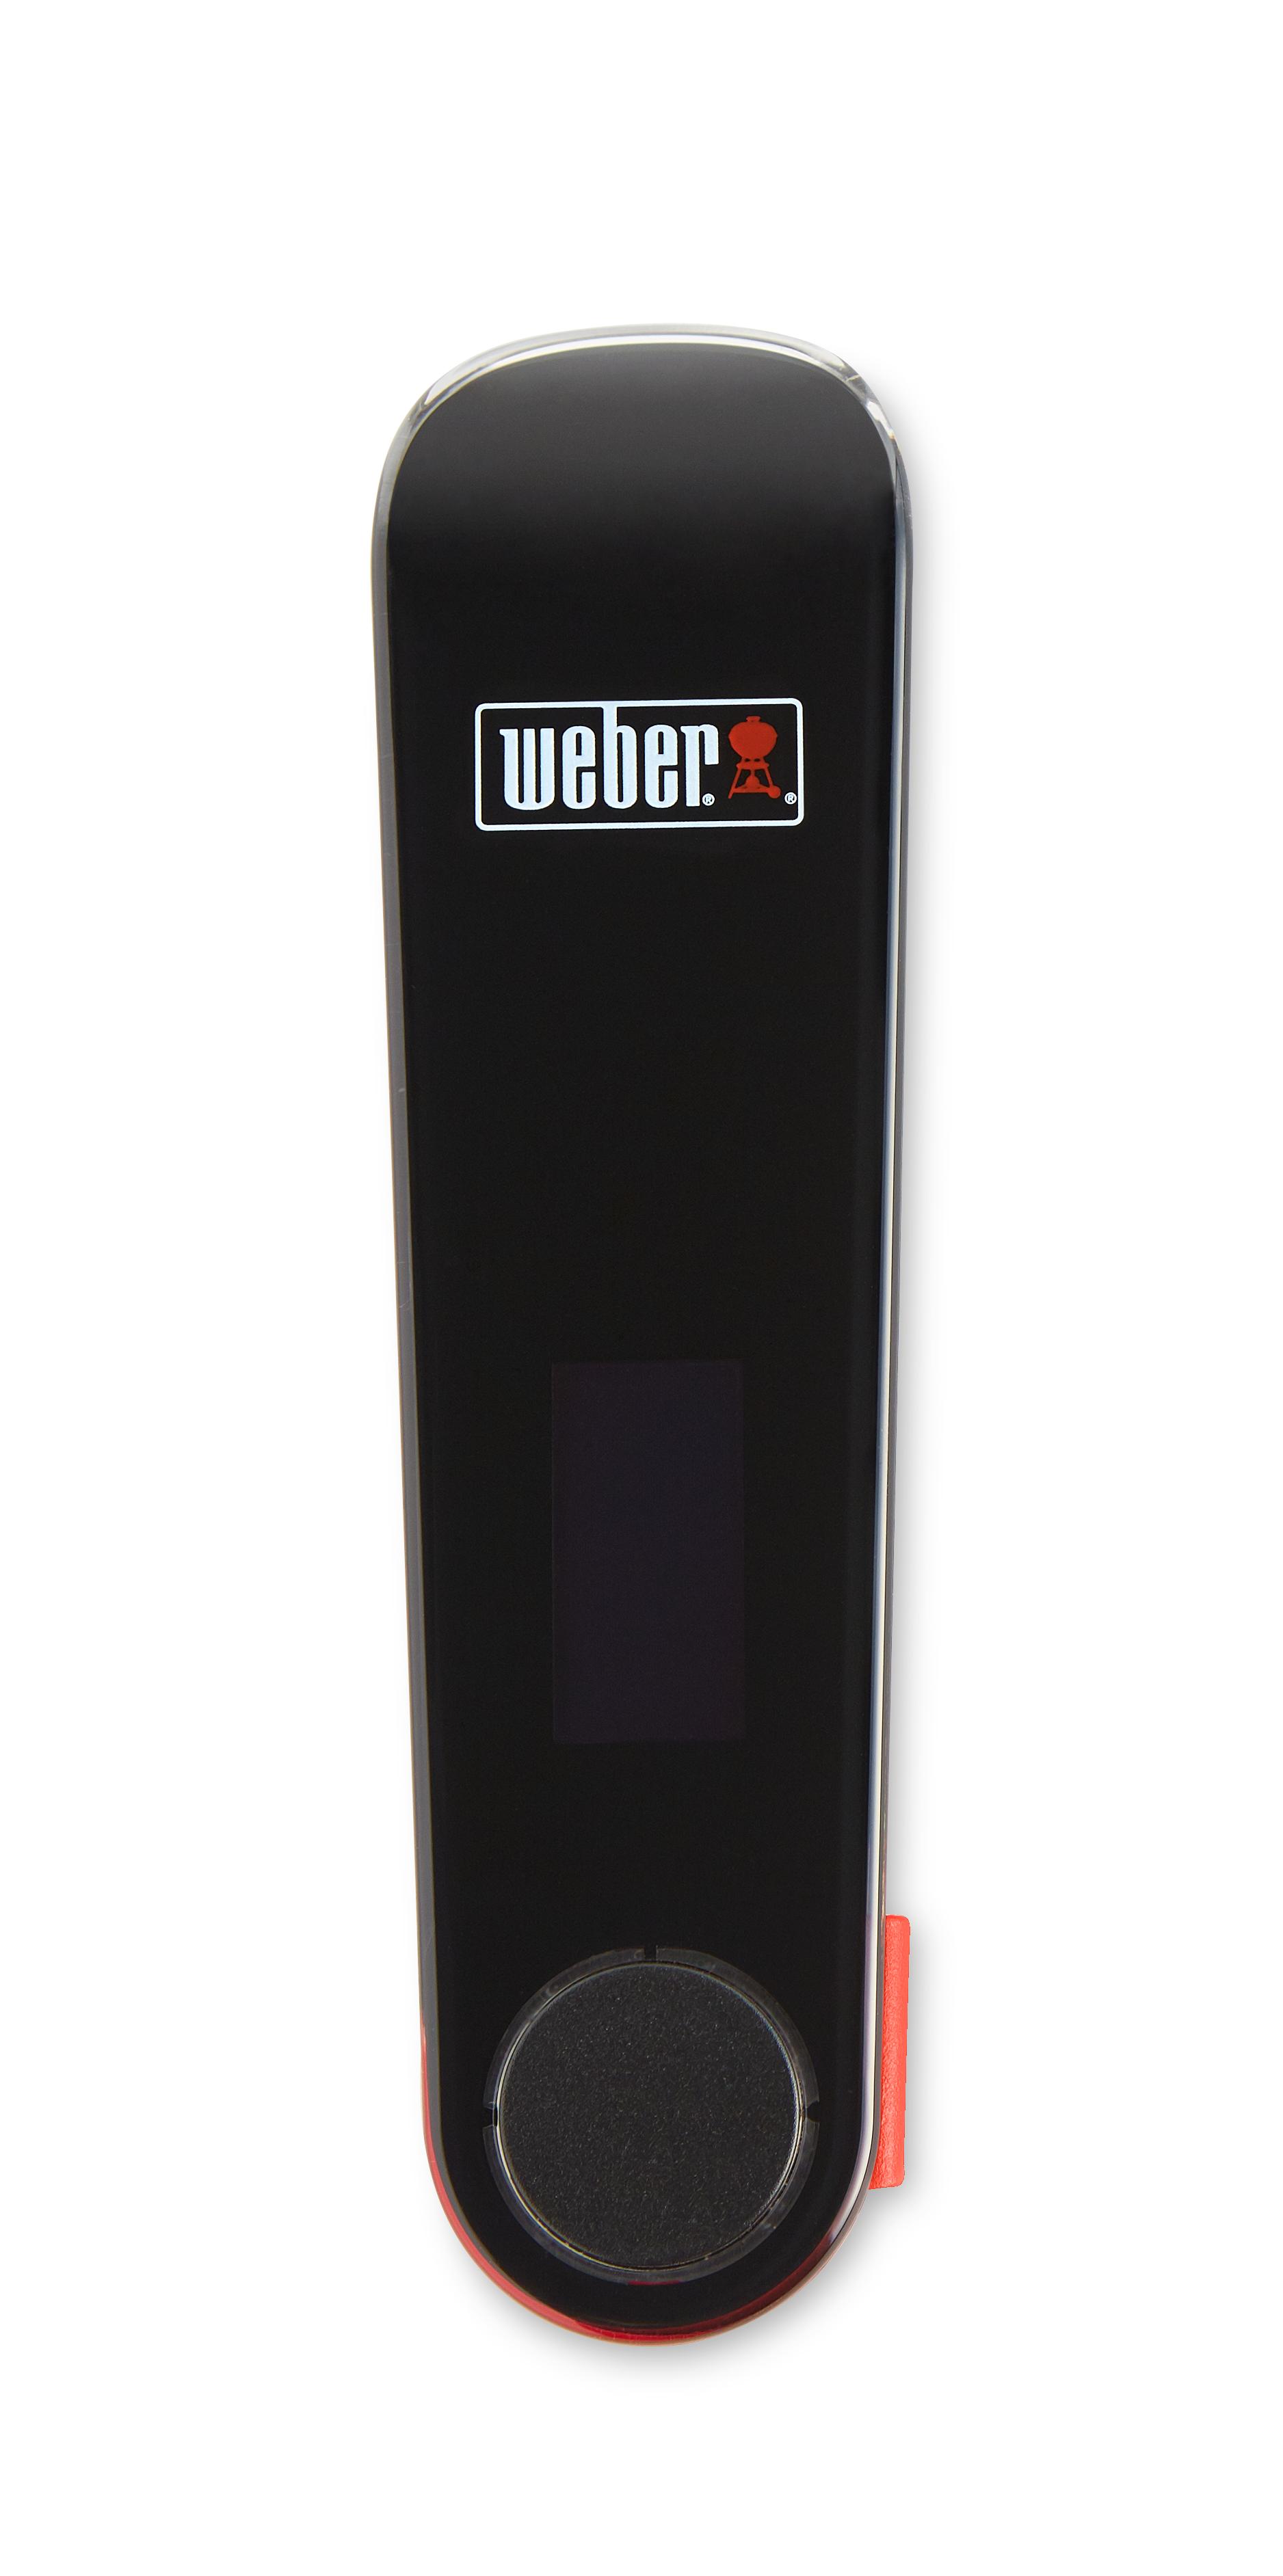 Weber SnapCheck Digitalthermometer